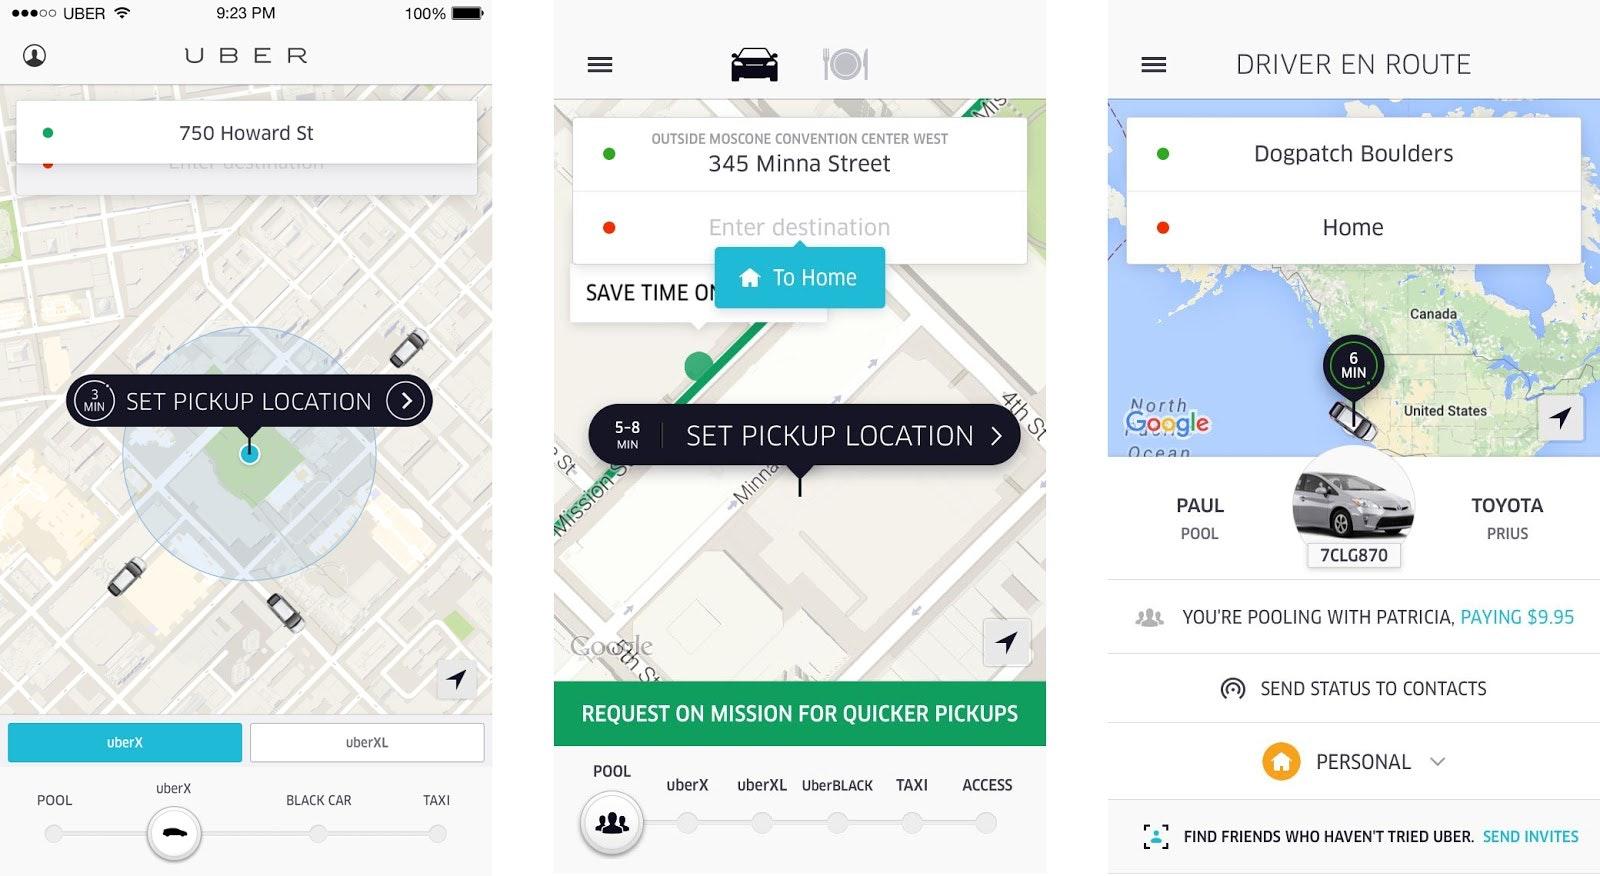 Uber app design changing 2012-2016